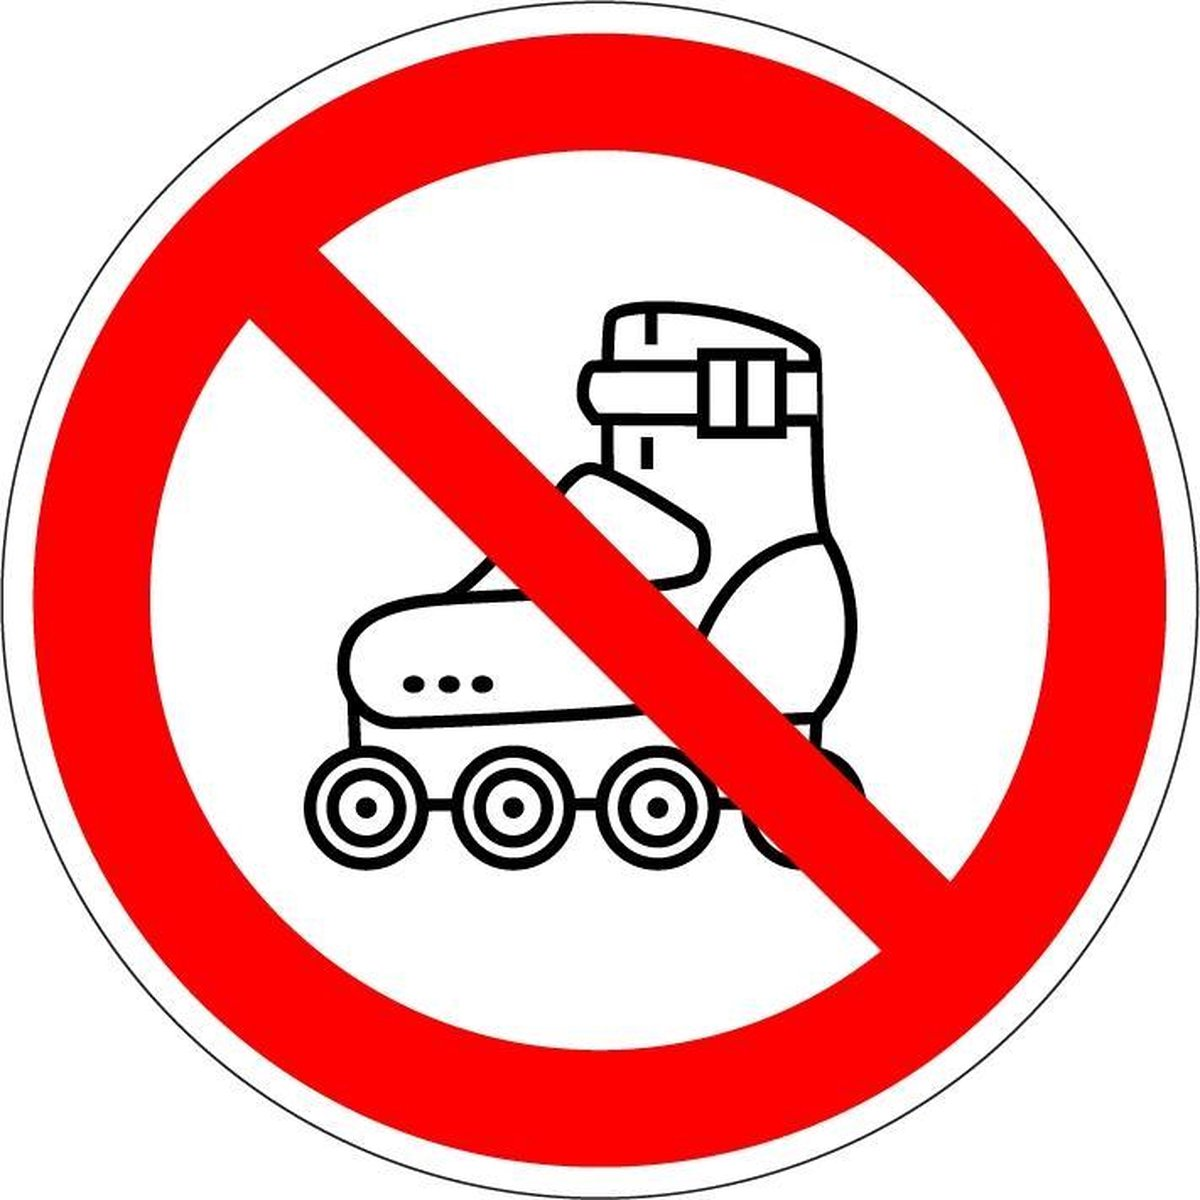 Verboden te skaten sticker 300 mm